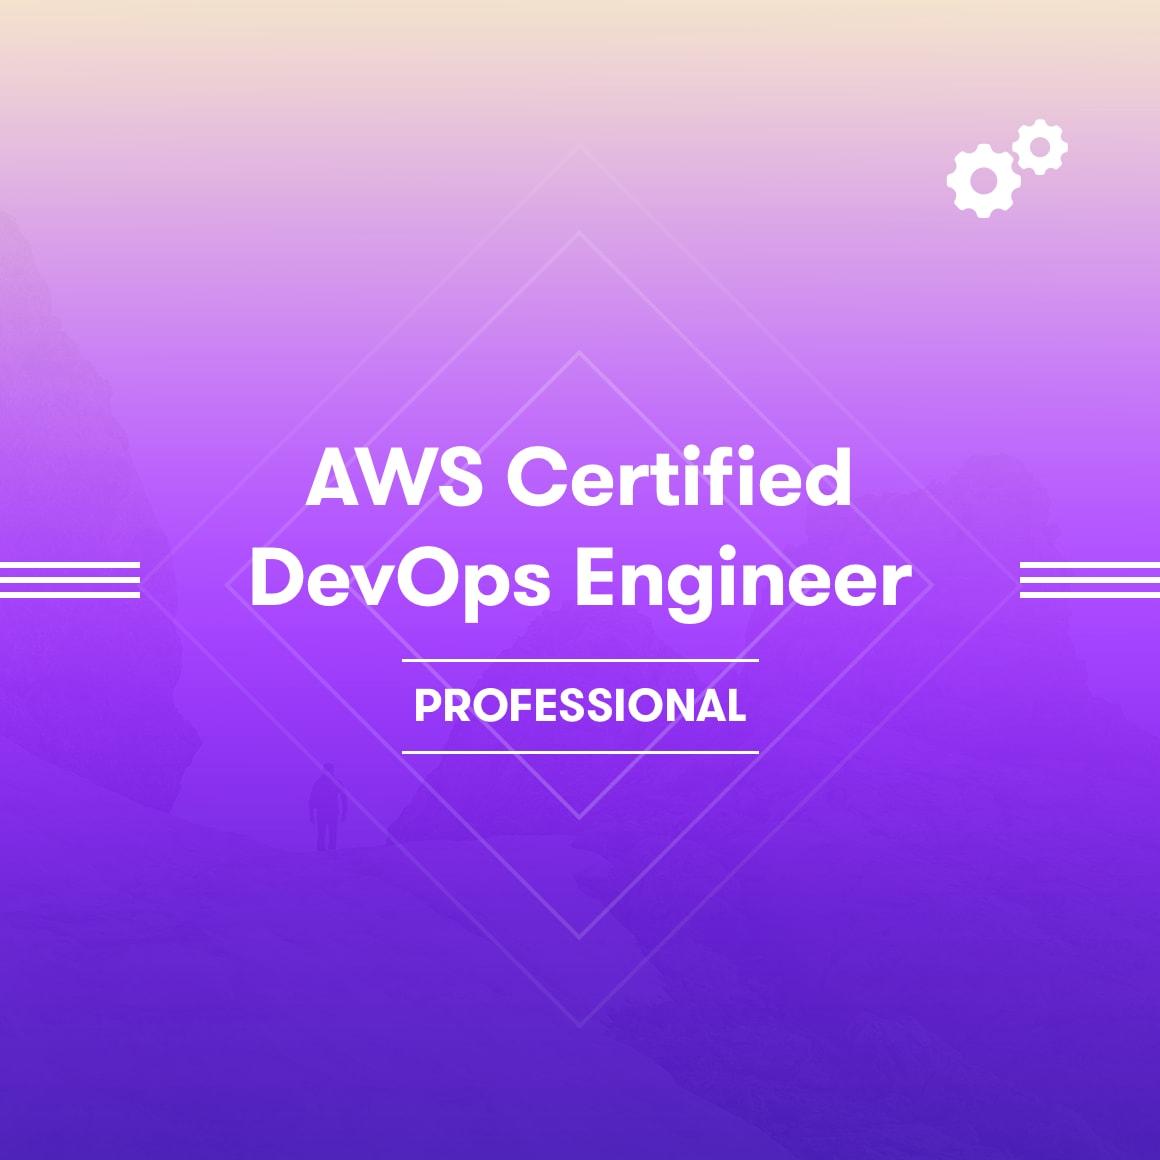 AWS Certified DevOps Professional 2019